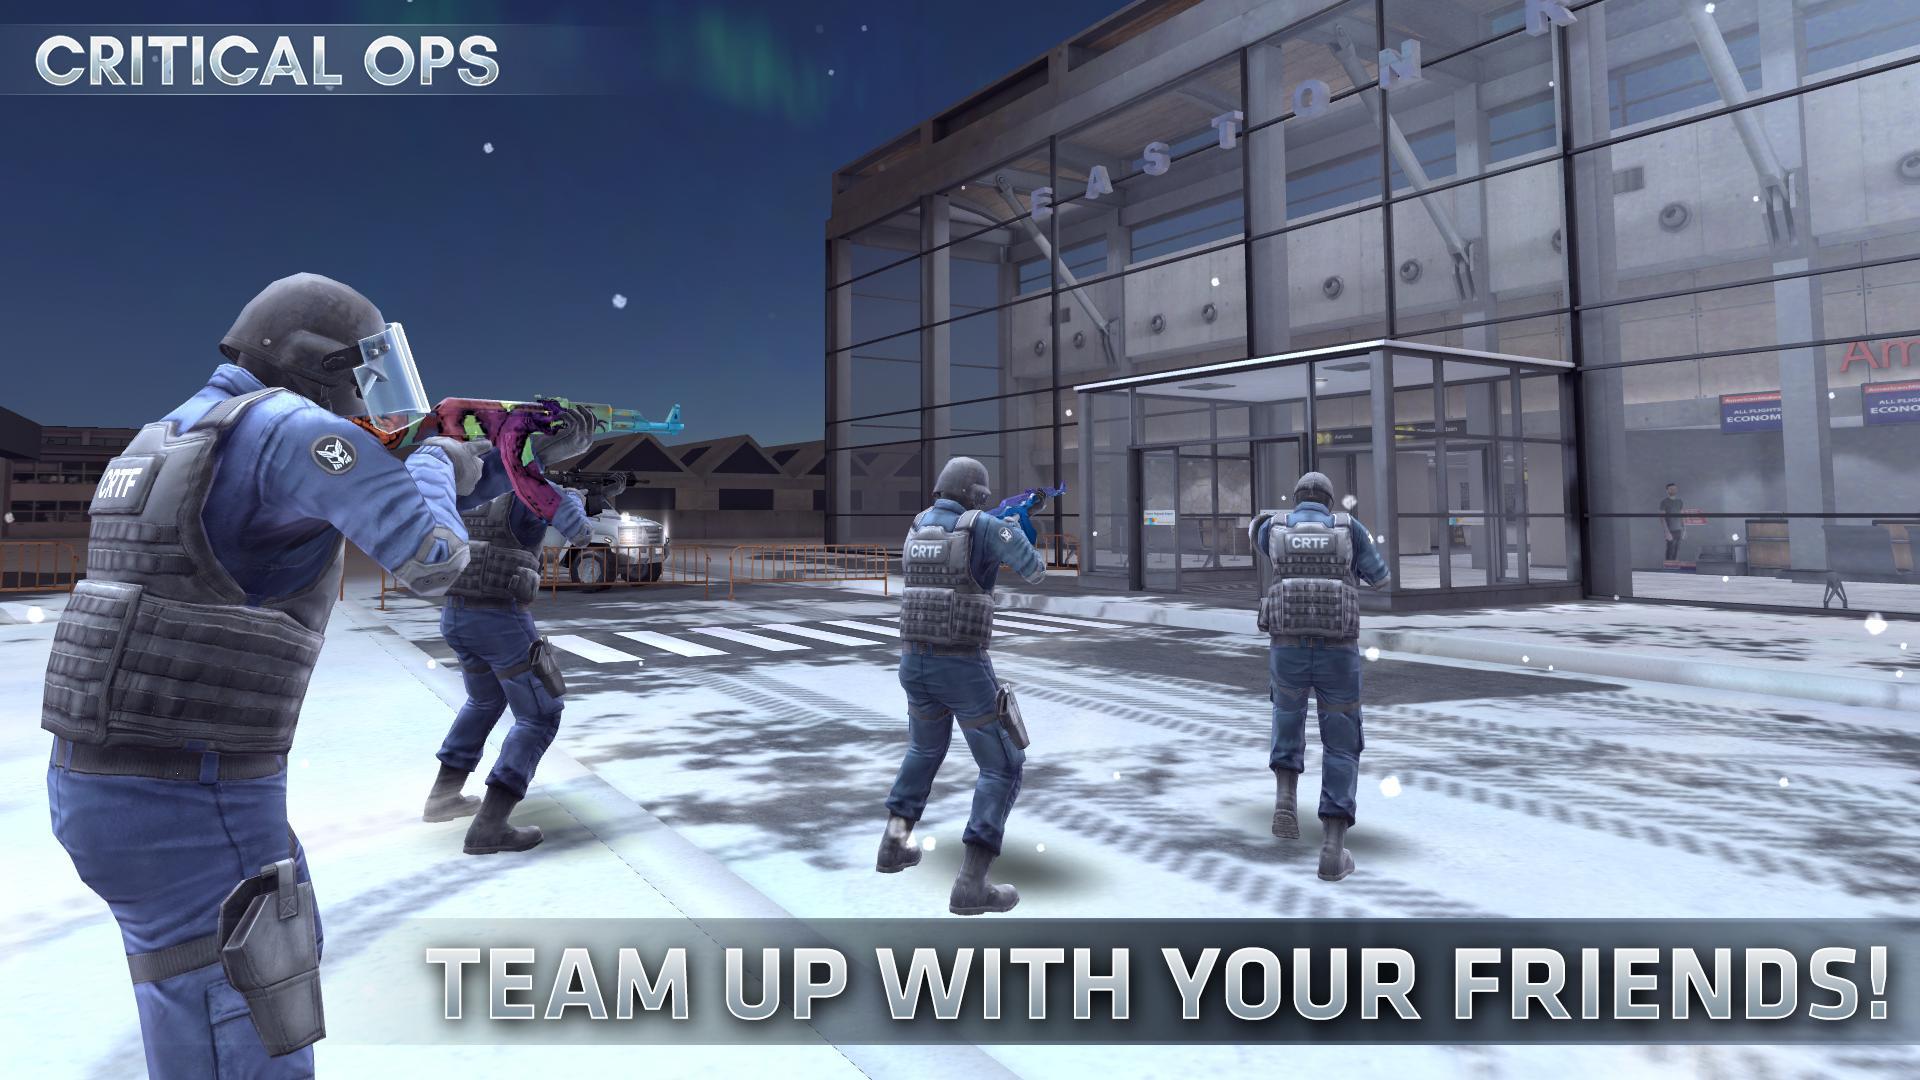 Critical Ops Multiplayer FPS 1.21.0.f1253 Screenshot 1